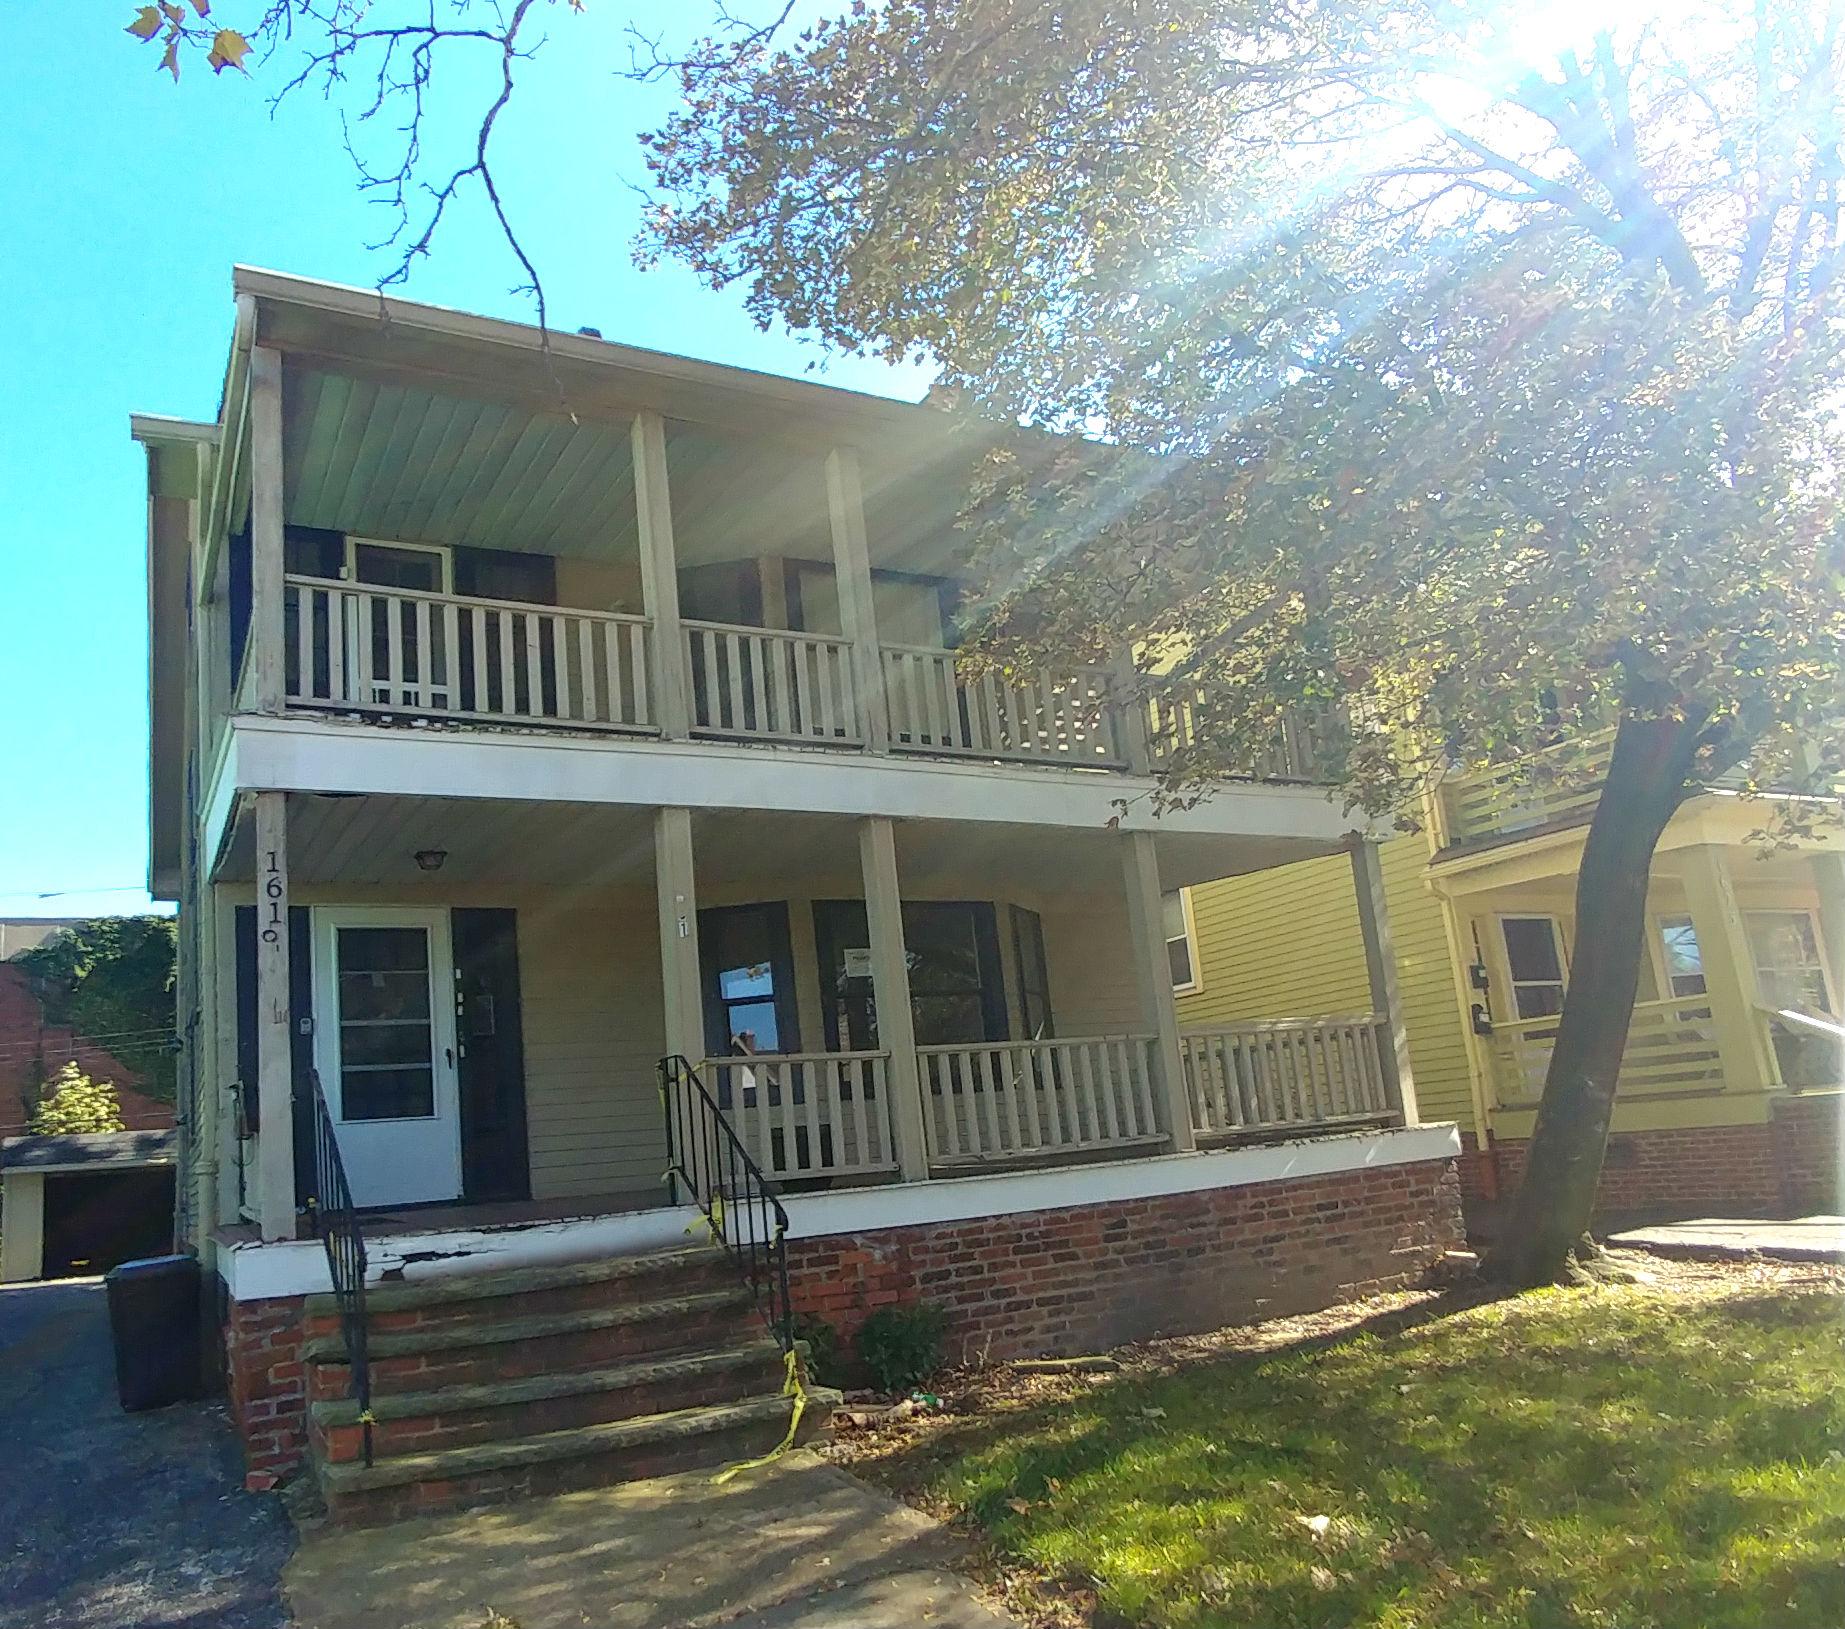 1619 Hillcrest Rd., Cleveland Hts. | 5 bed 3 bath | 2,152 Sq. Ft. | $41,000